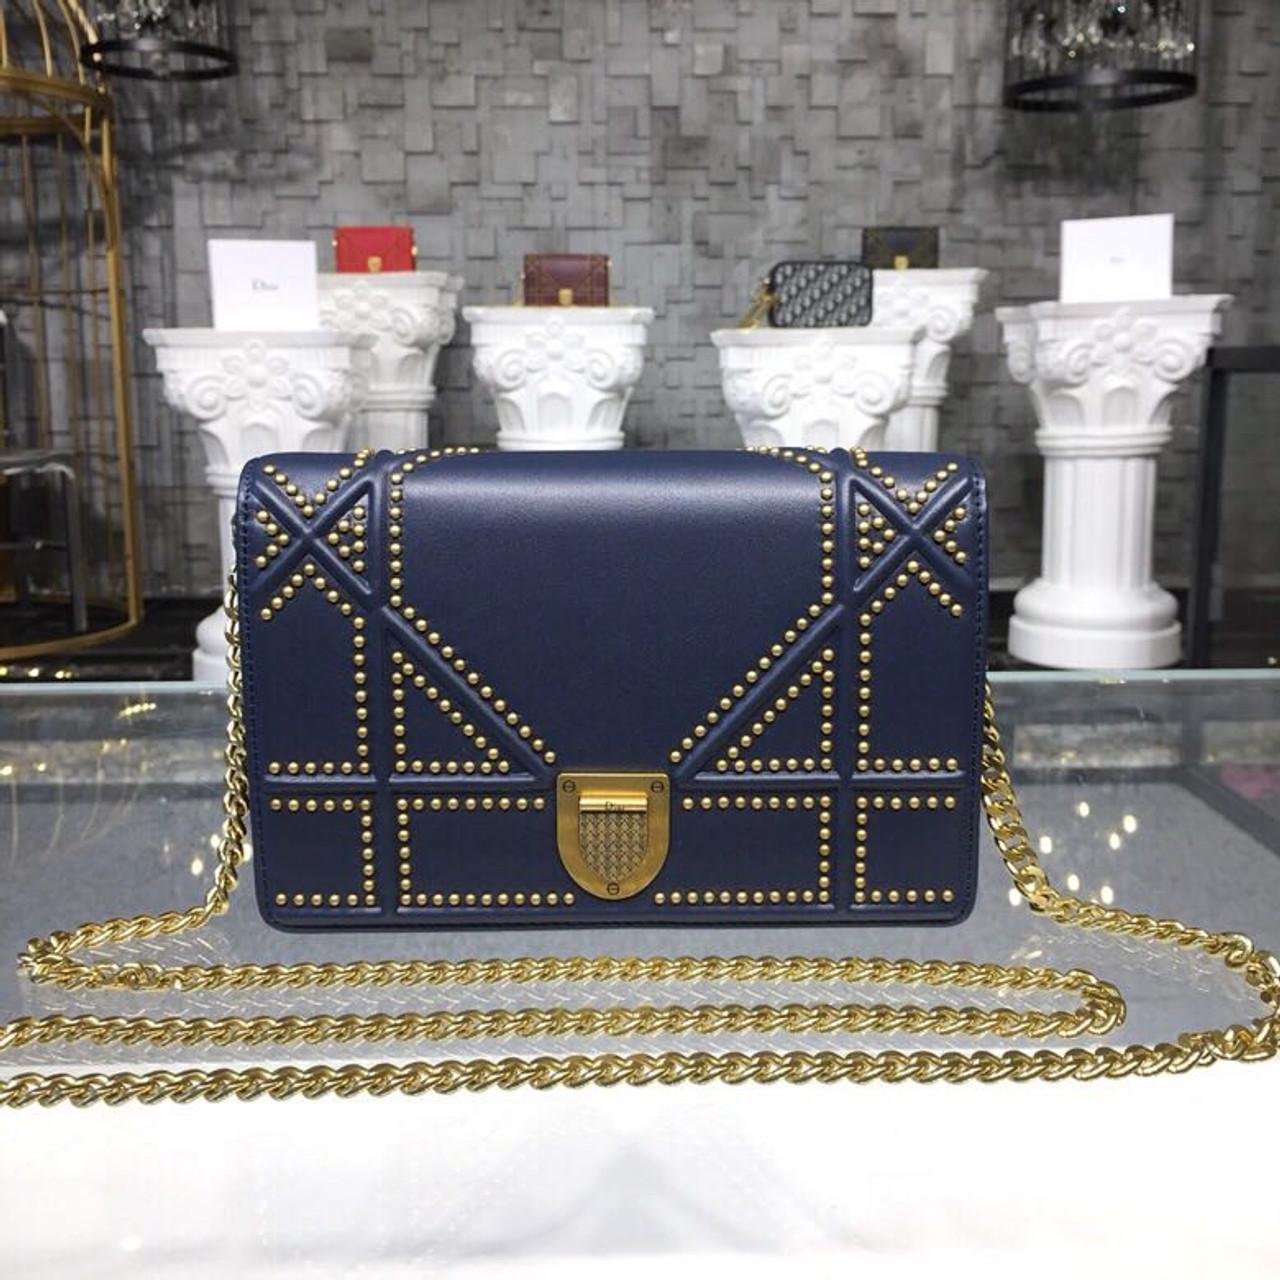 38a56efbf6bd Christian Dior Diorama Studded WOC Chain Clutch 20cm Calfskin Leather  Fall Winter 2018 Collection